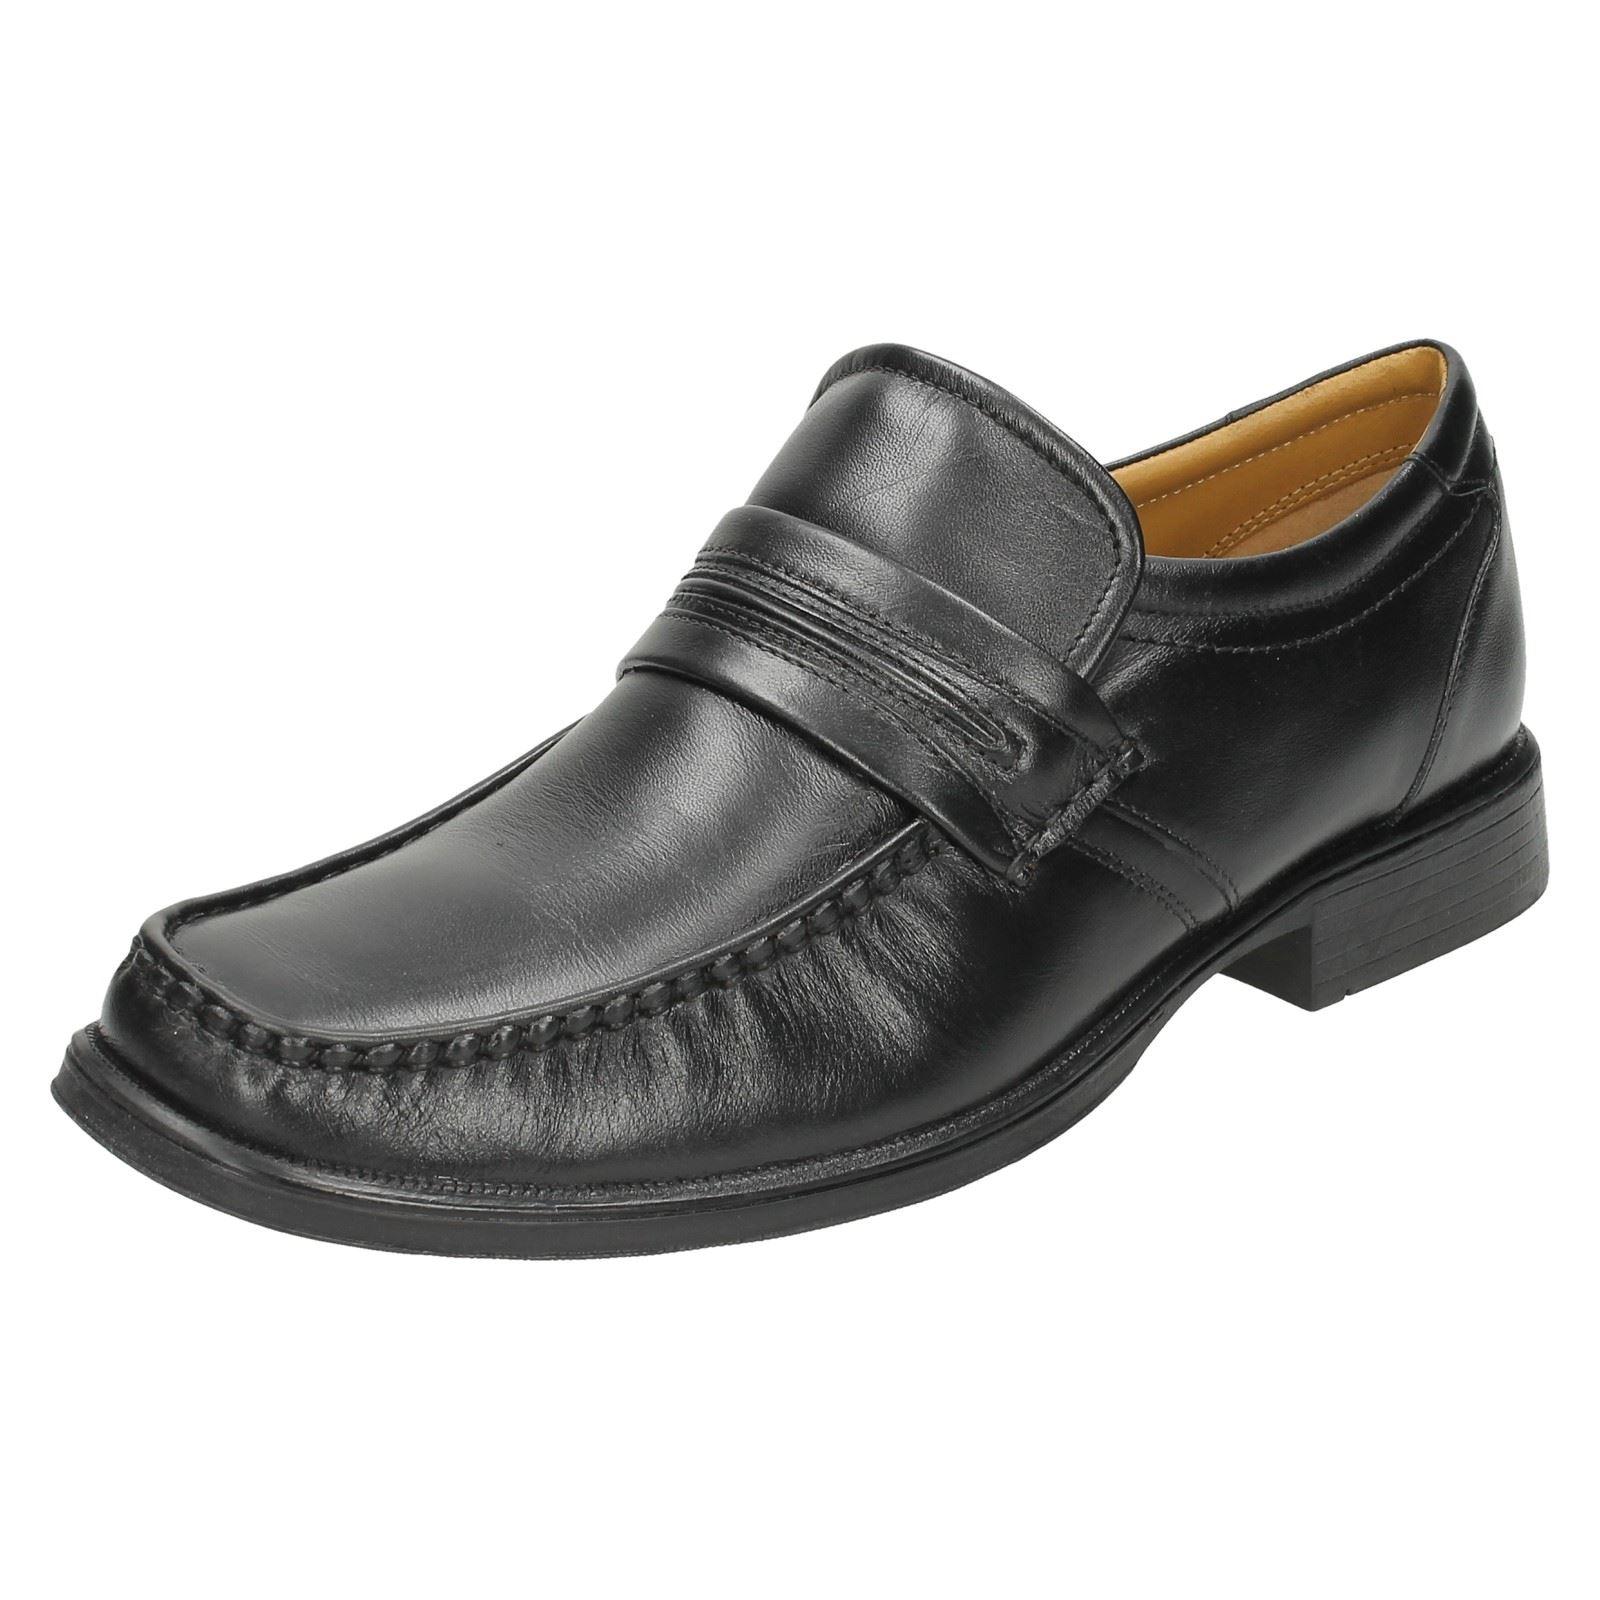 Clarks  Uomo Formal Work Slip On Schuhes Handle Work Formal 69add2